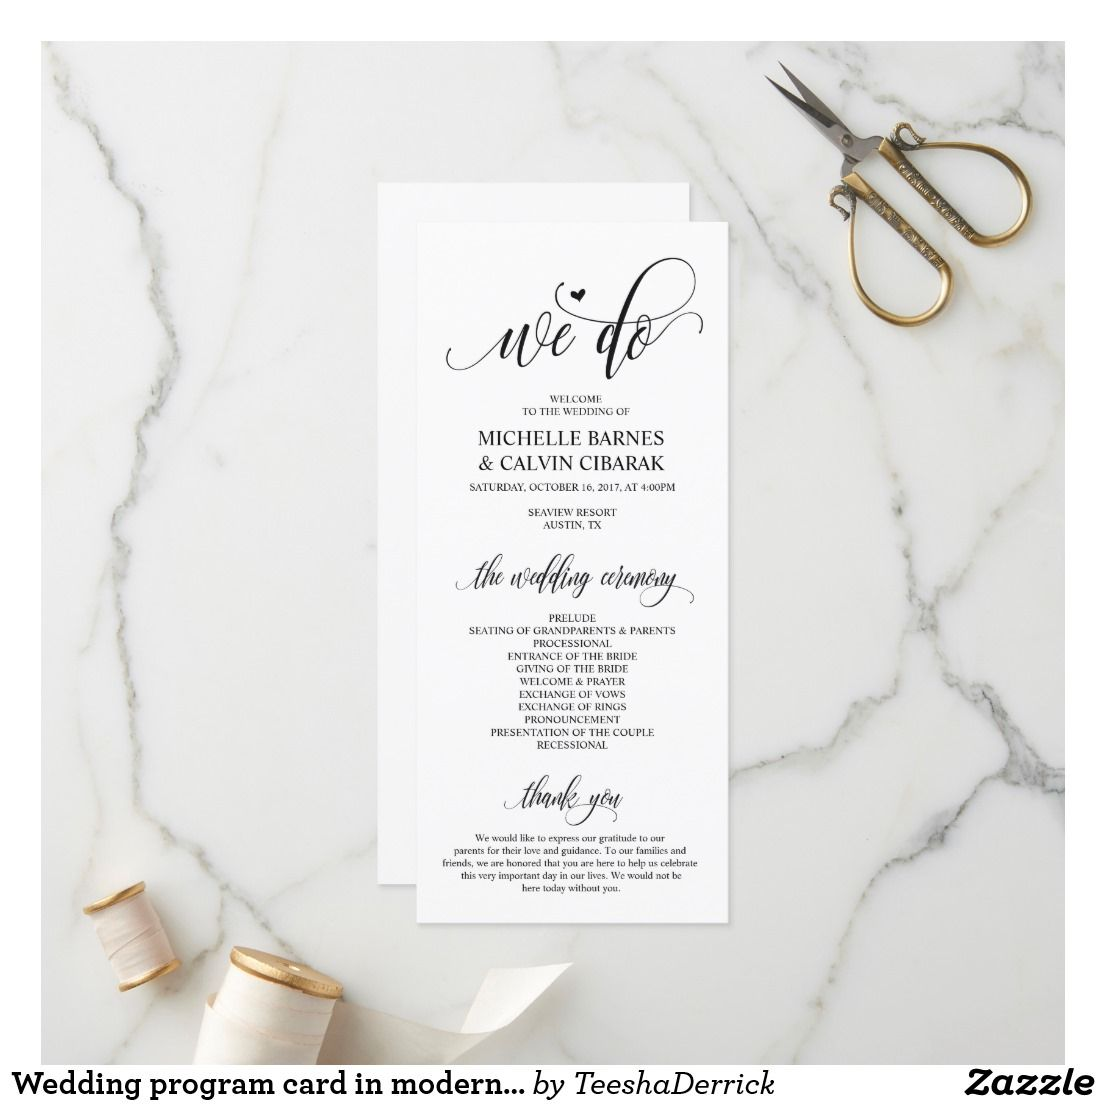 Wedding Program Card In Modern Design V3 Zazzle Com Wedding Programs Wedding Party Cards Order Of Wedding Ceremony